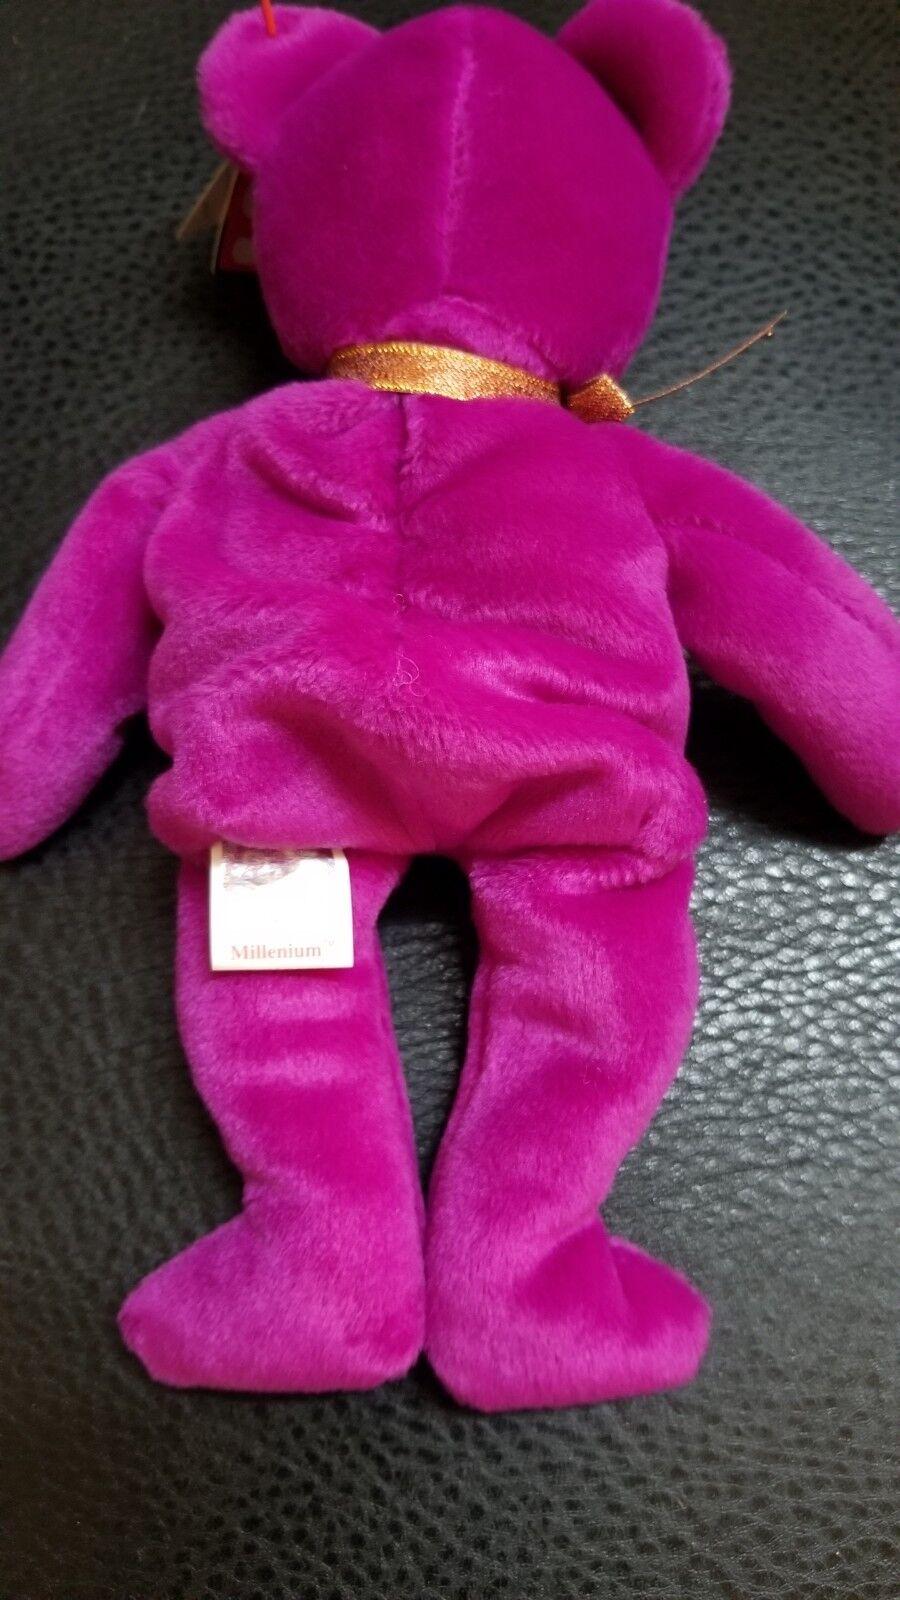 ... Authenticated Rare 1991 TY Beanie Baby - MILLENNIUM the Bear Bear the w  errors 0ab339 ... ab0782eddab5